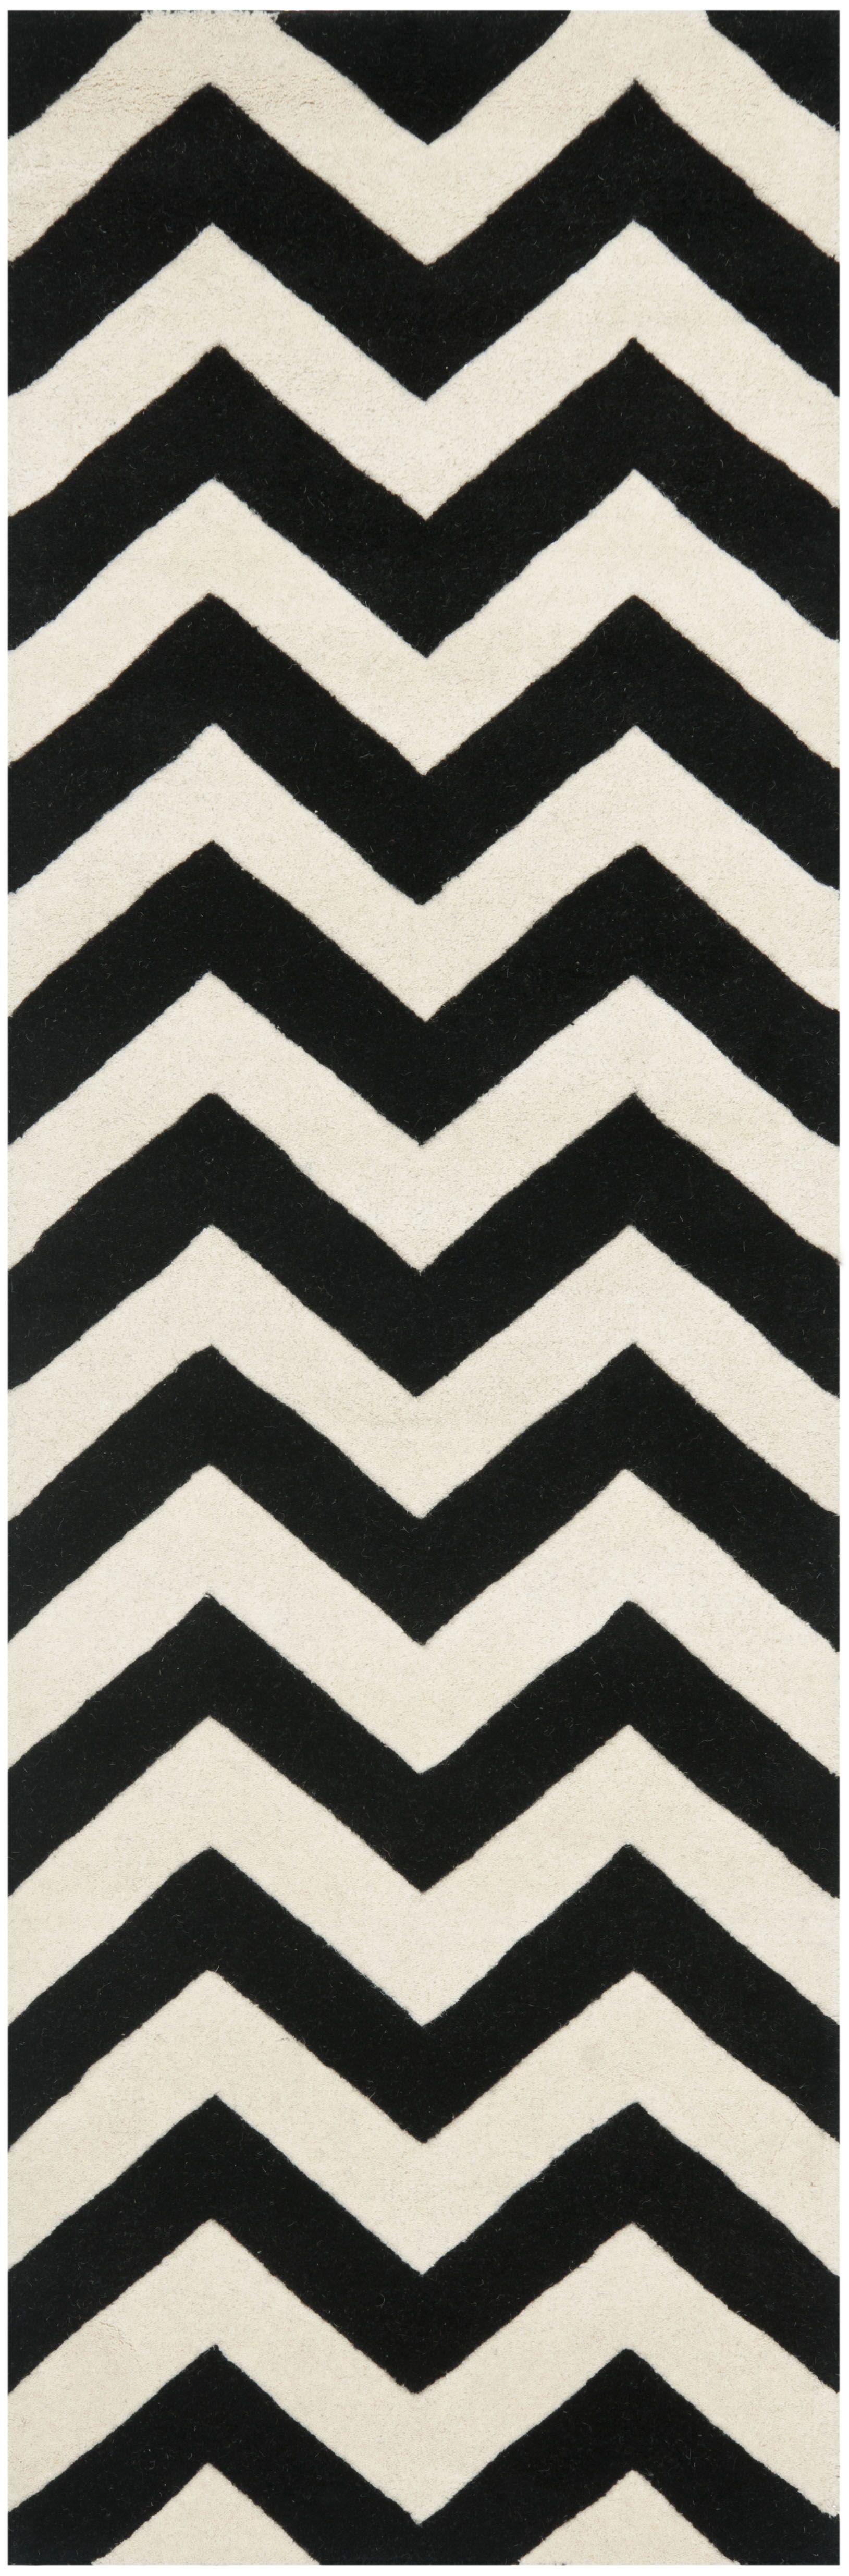 One-of-Kind Wilkin Chevron Hand-Tufted Wool Ivory/Black Area Rug Rug Size: Runner 2'3